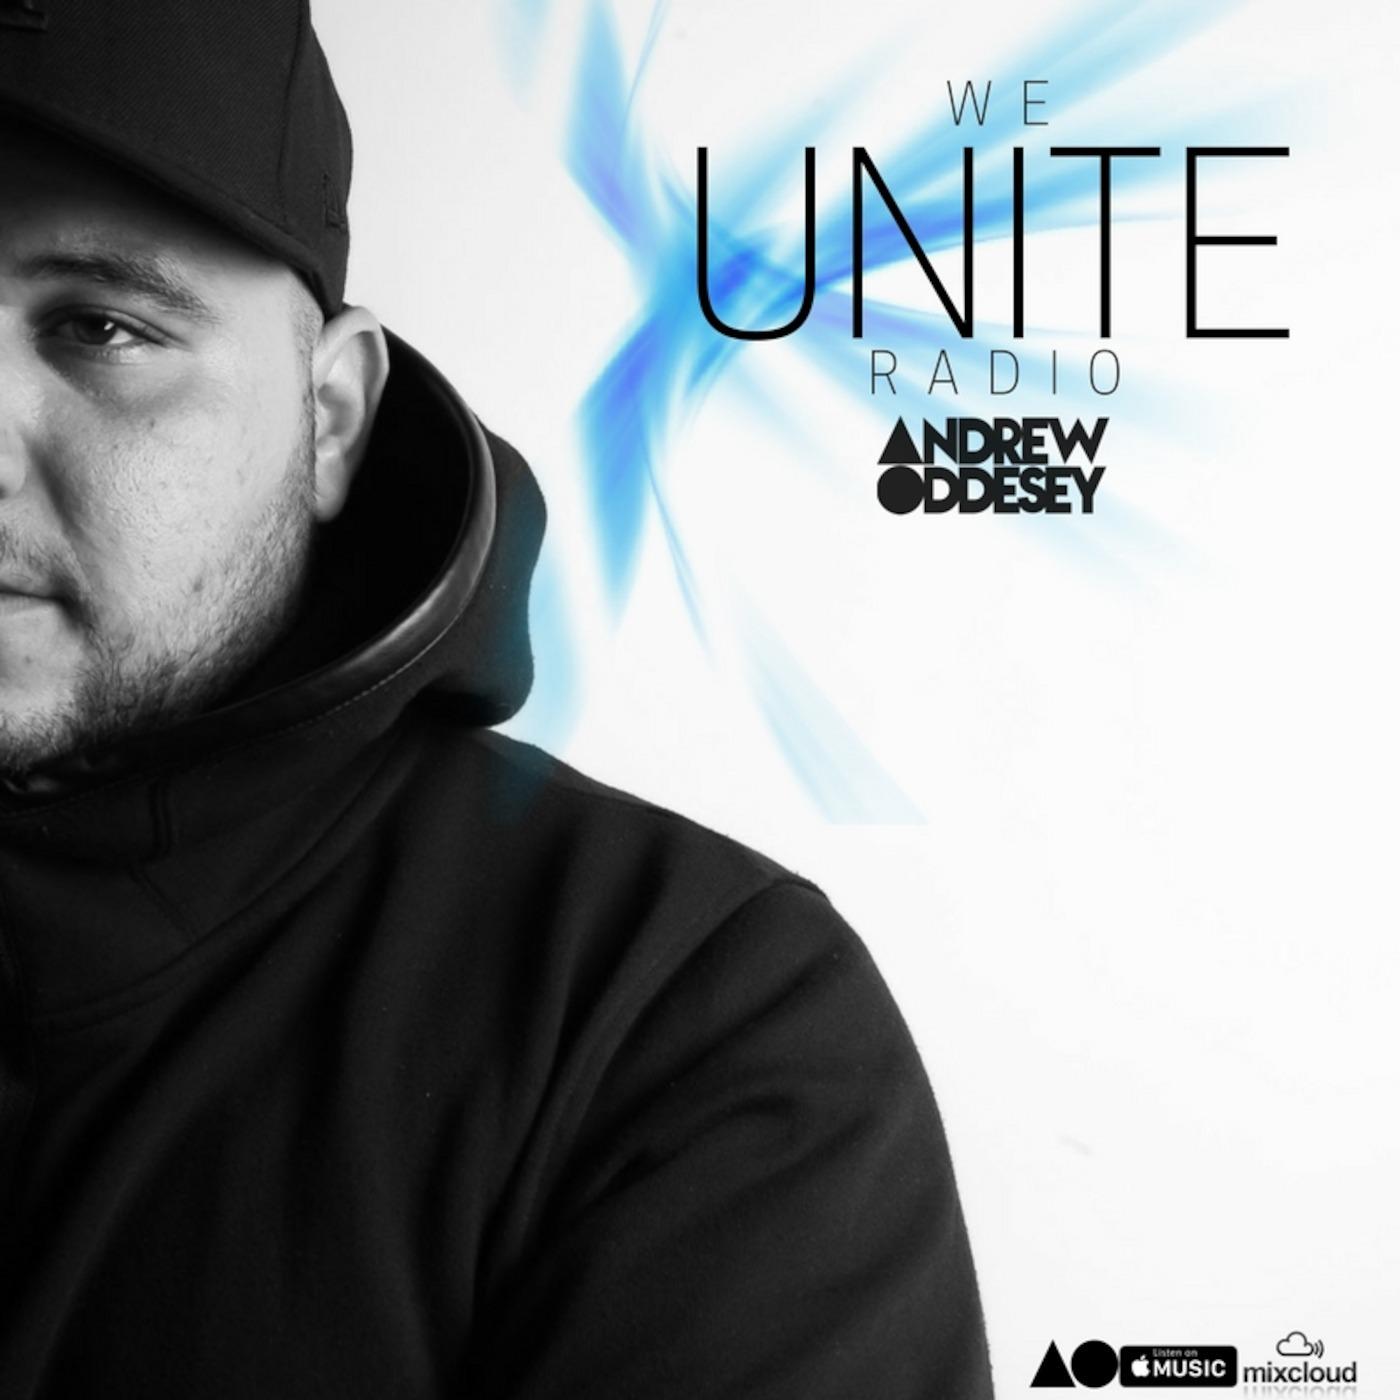 Andrew Oddesey We Unite Radio Podcast